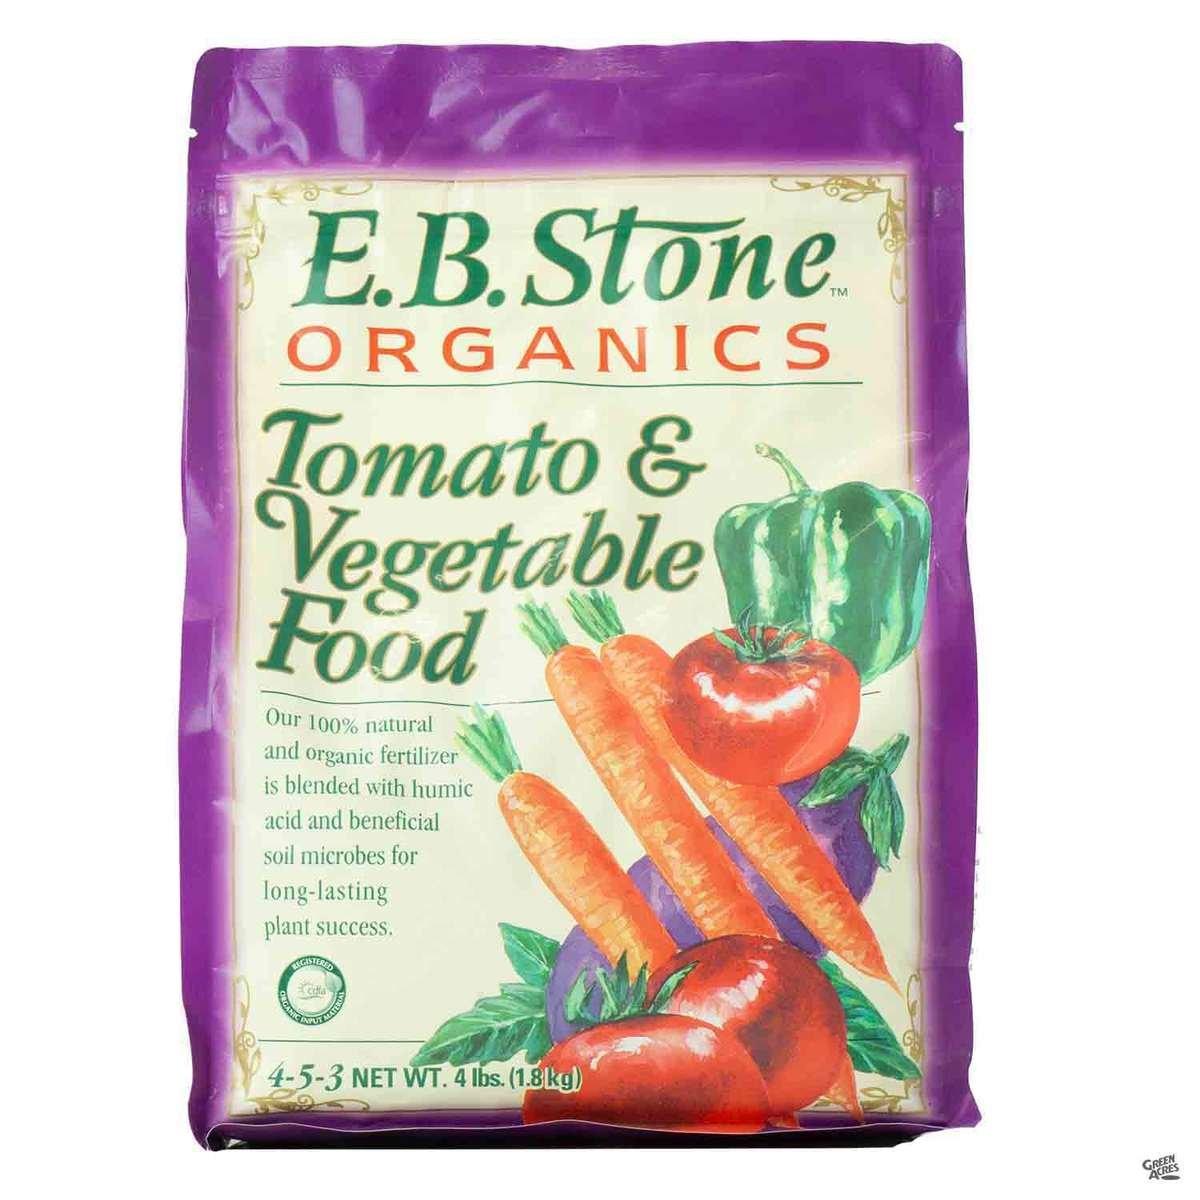 E.B. Stone™ Organics Tomato & Vegetable Food